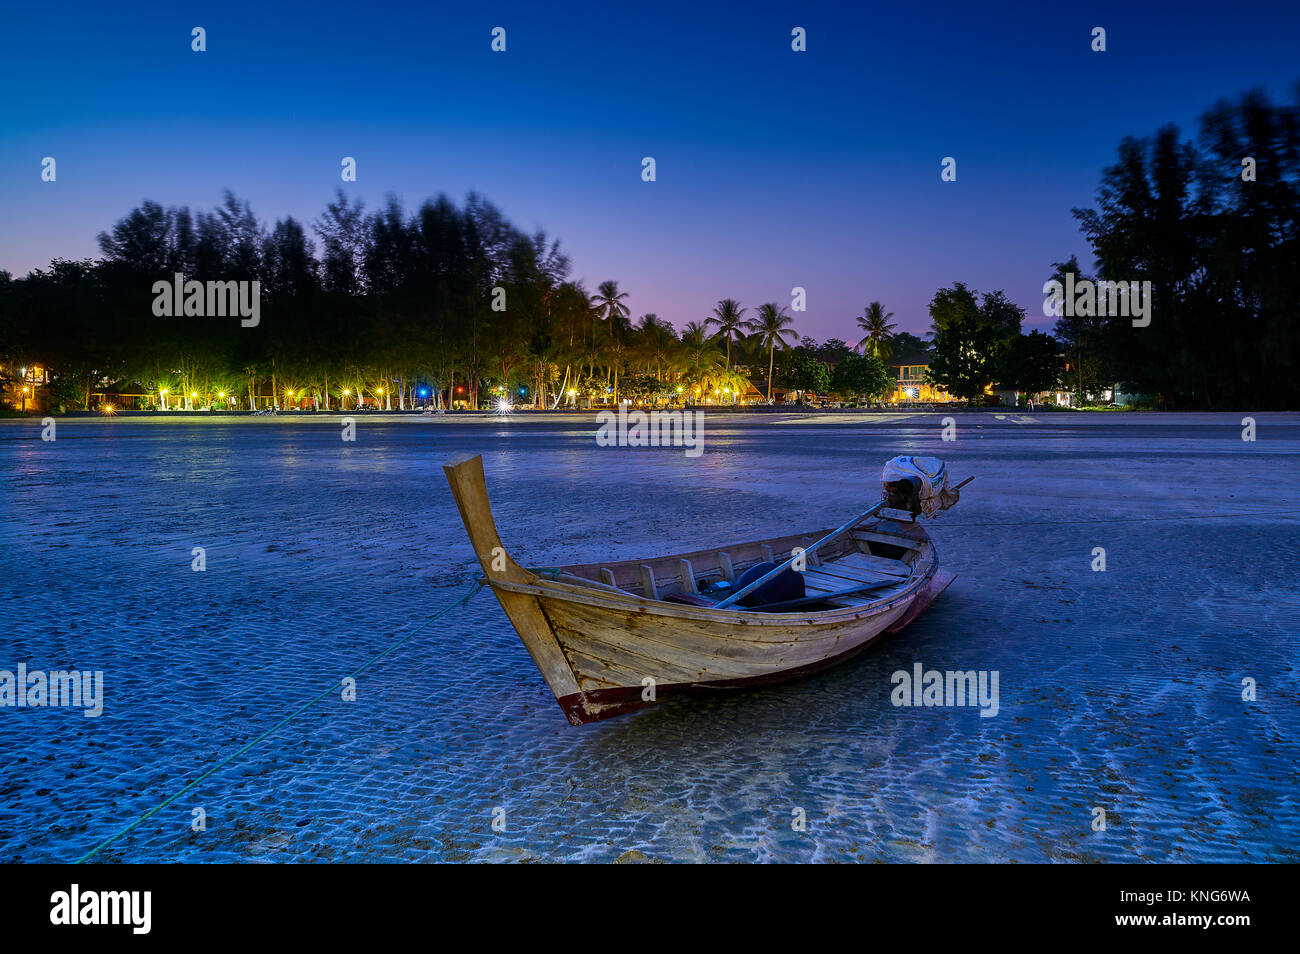 Koh Samui, Surat Thani, Thailand. - Stock Image